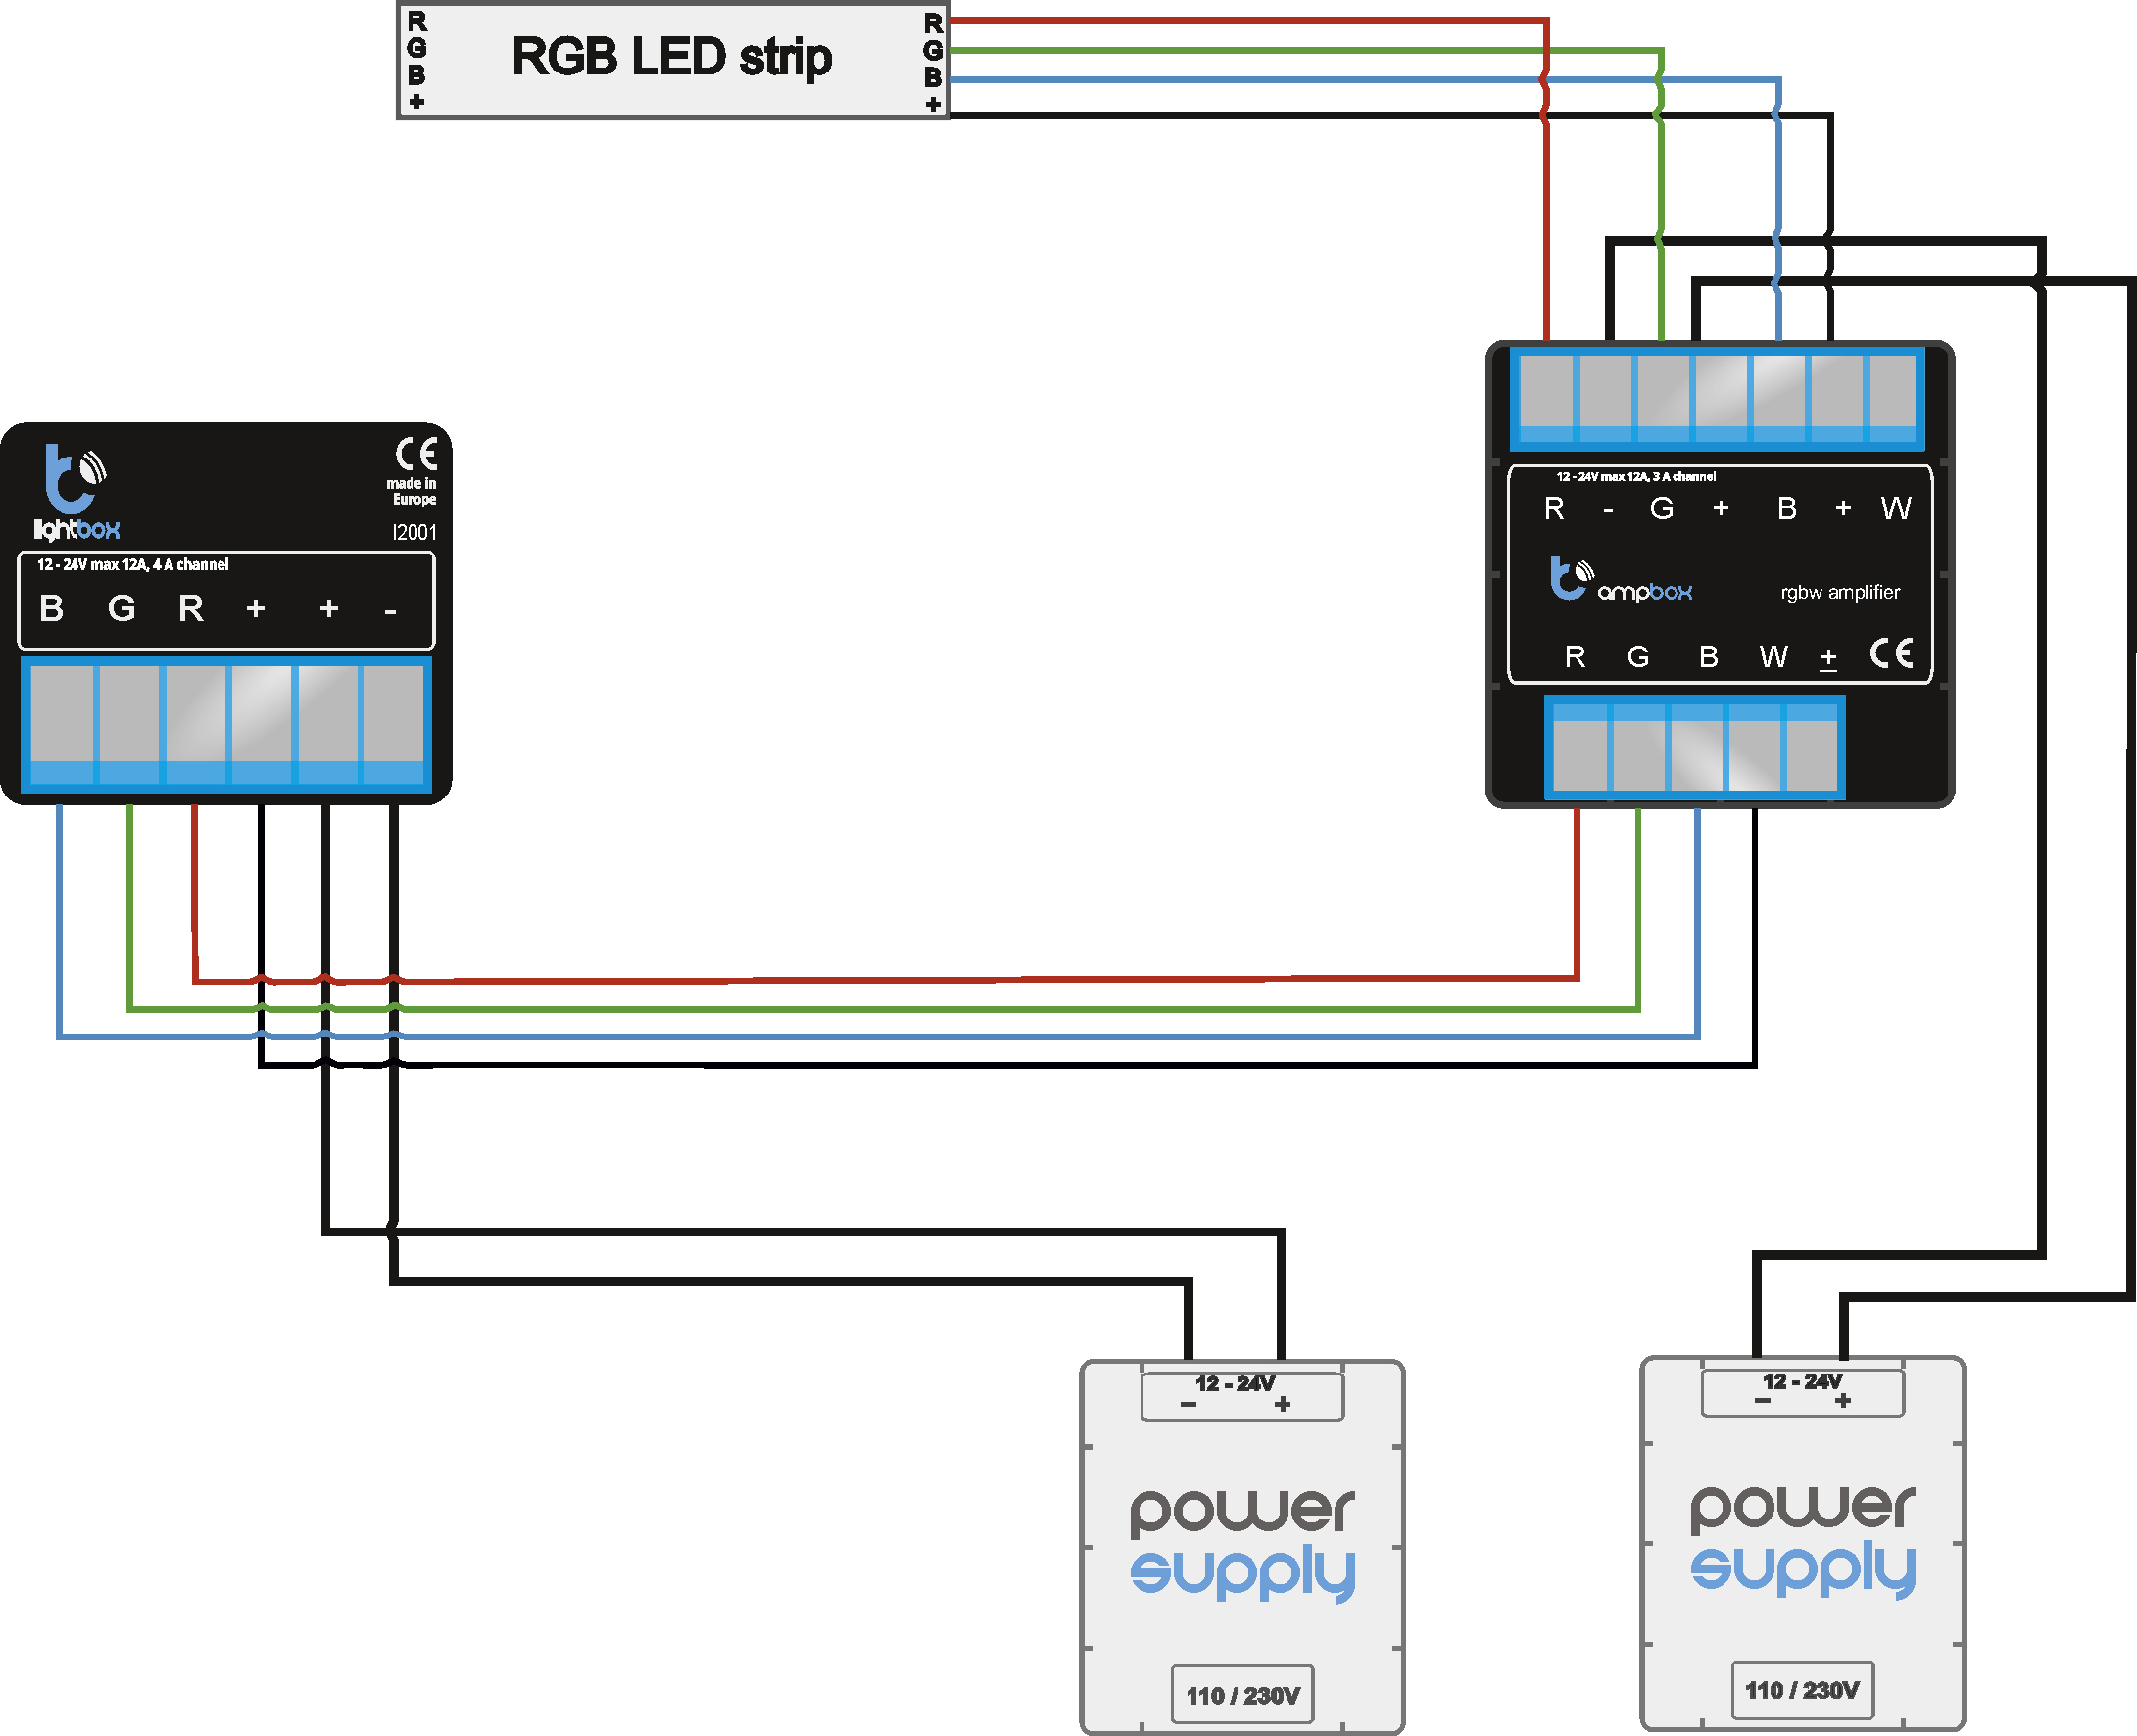 ampbox-lightBox-without-2d-led-strip